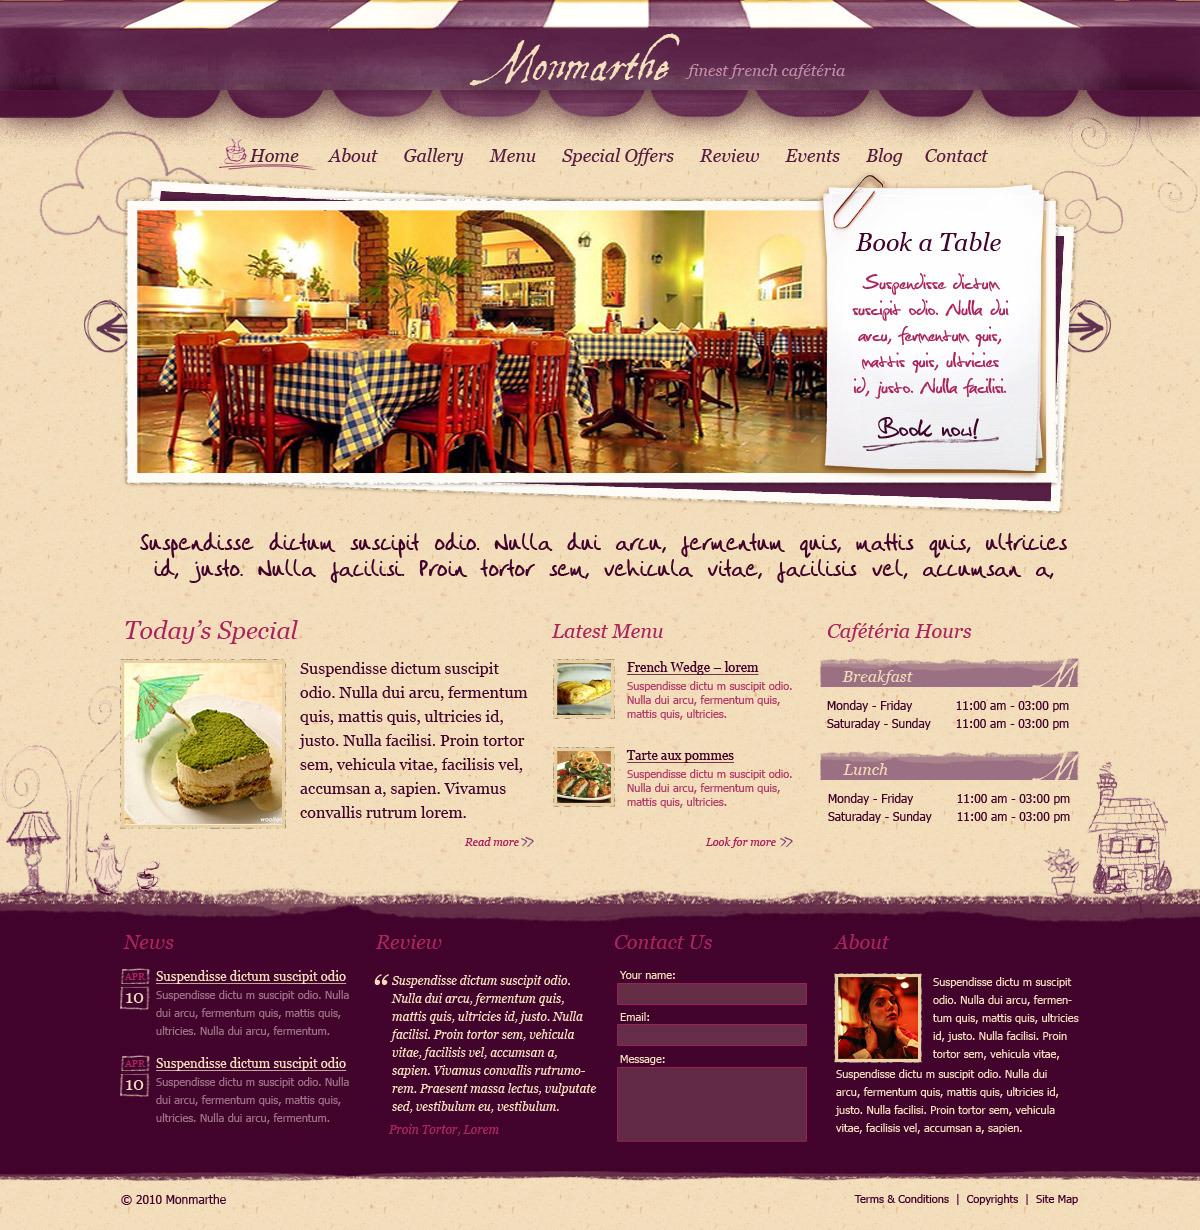 monmarthe restaurant cafe html template by themelaboratory themeforest. Black Bedroom Furniture Sets. Home Design Ideas